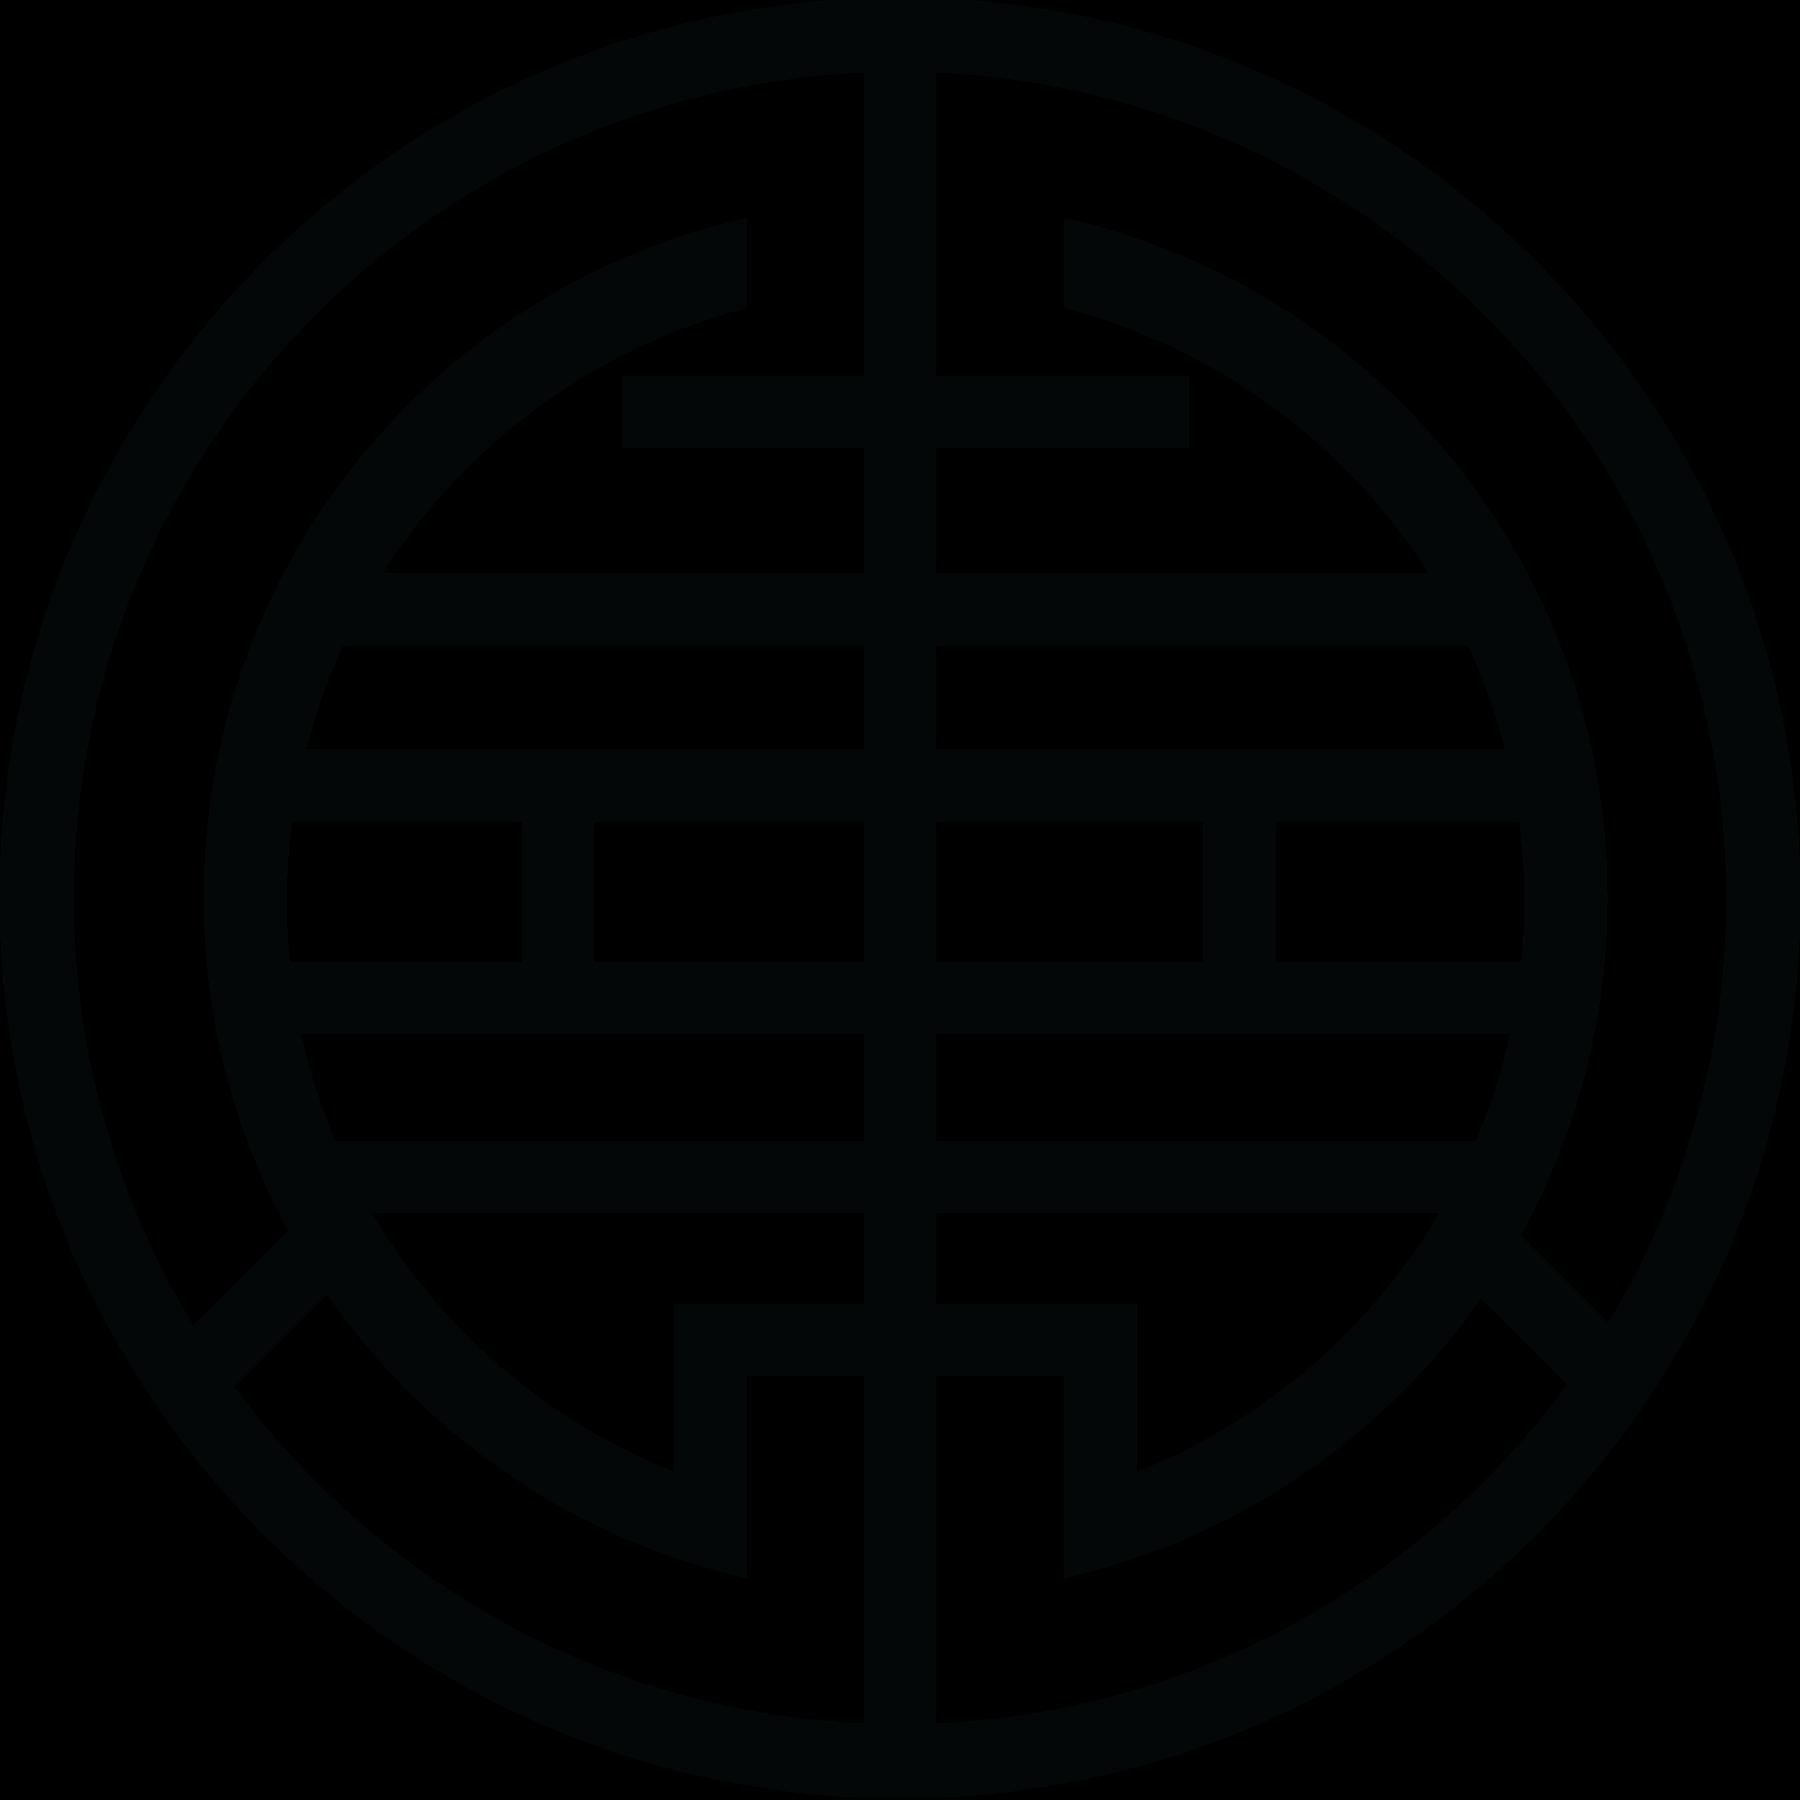 Japanese clipart korean. Patterns forty five symbols